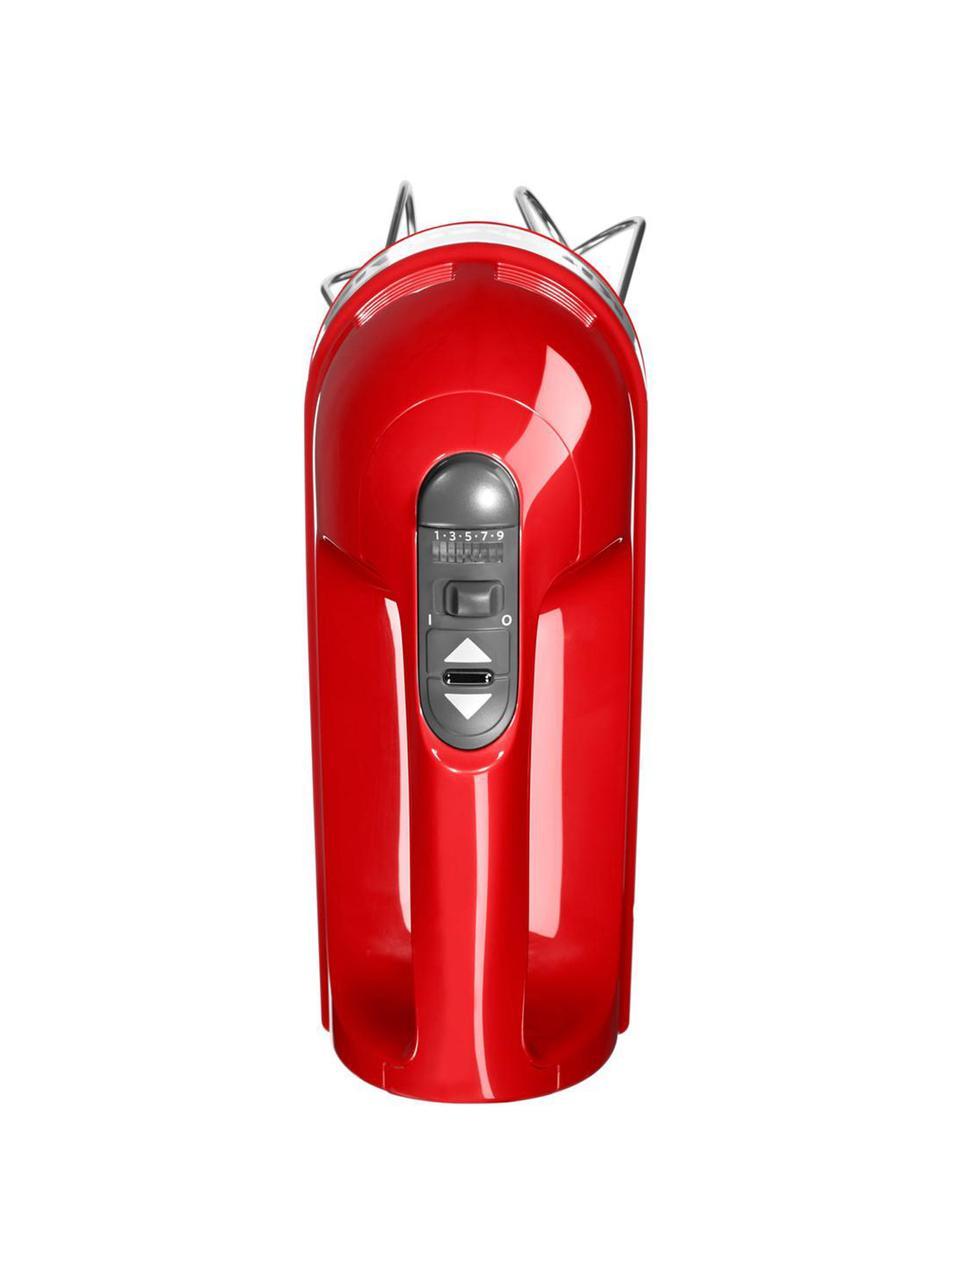 Sbattitore elettrico KitchenAid, Rosso lucido, Larg. 15 x Alt. 20 cm